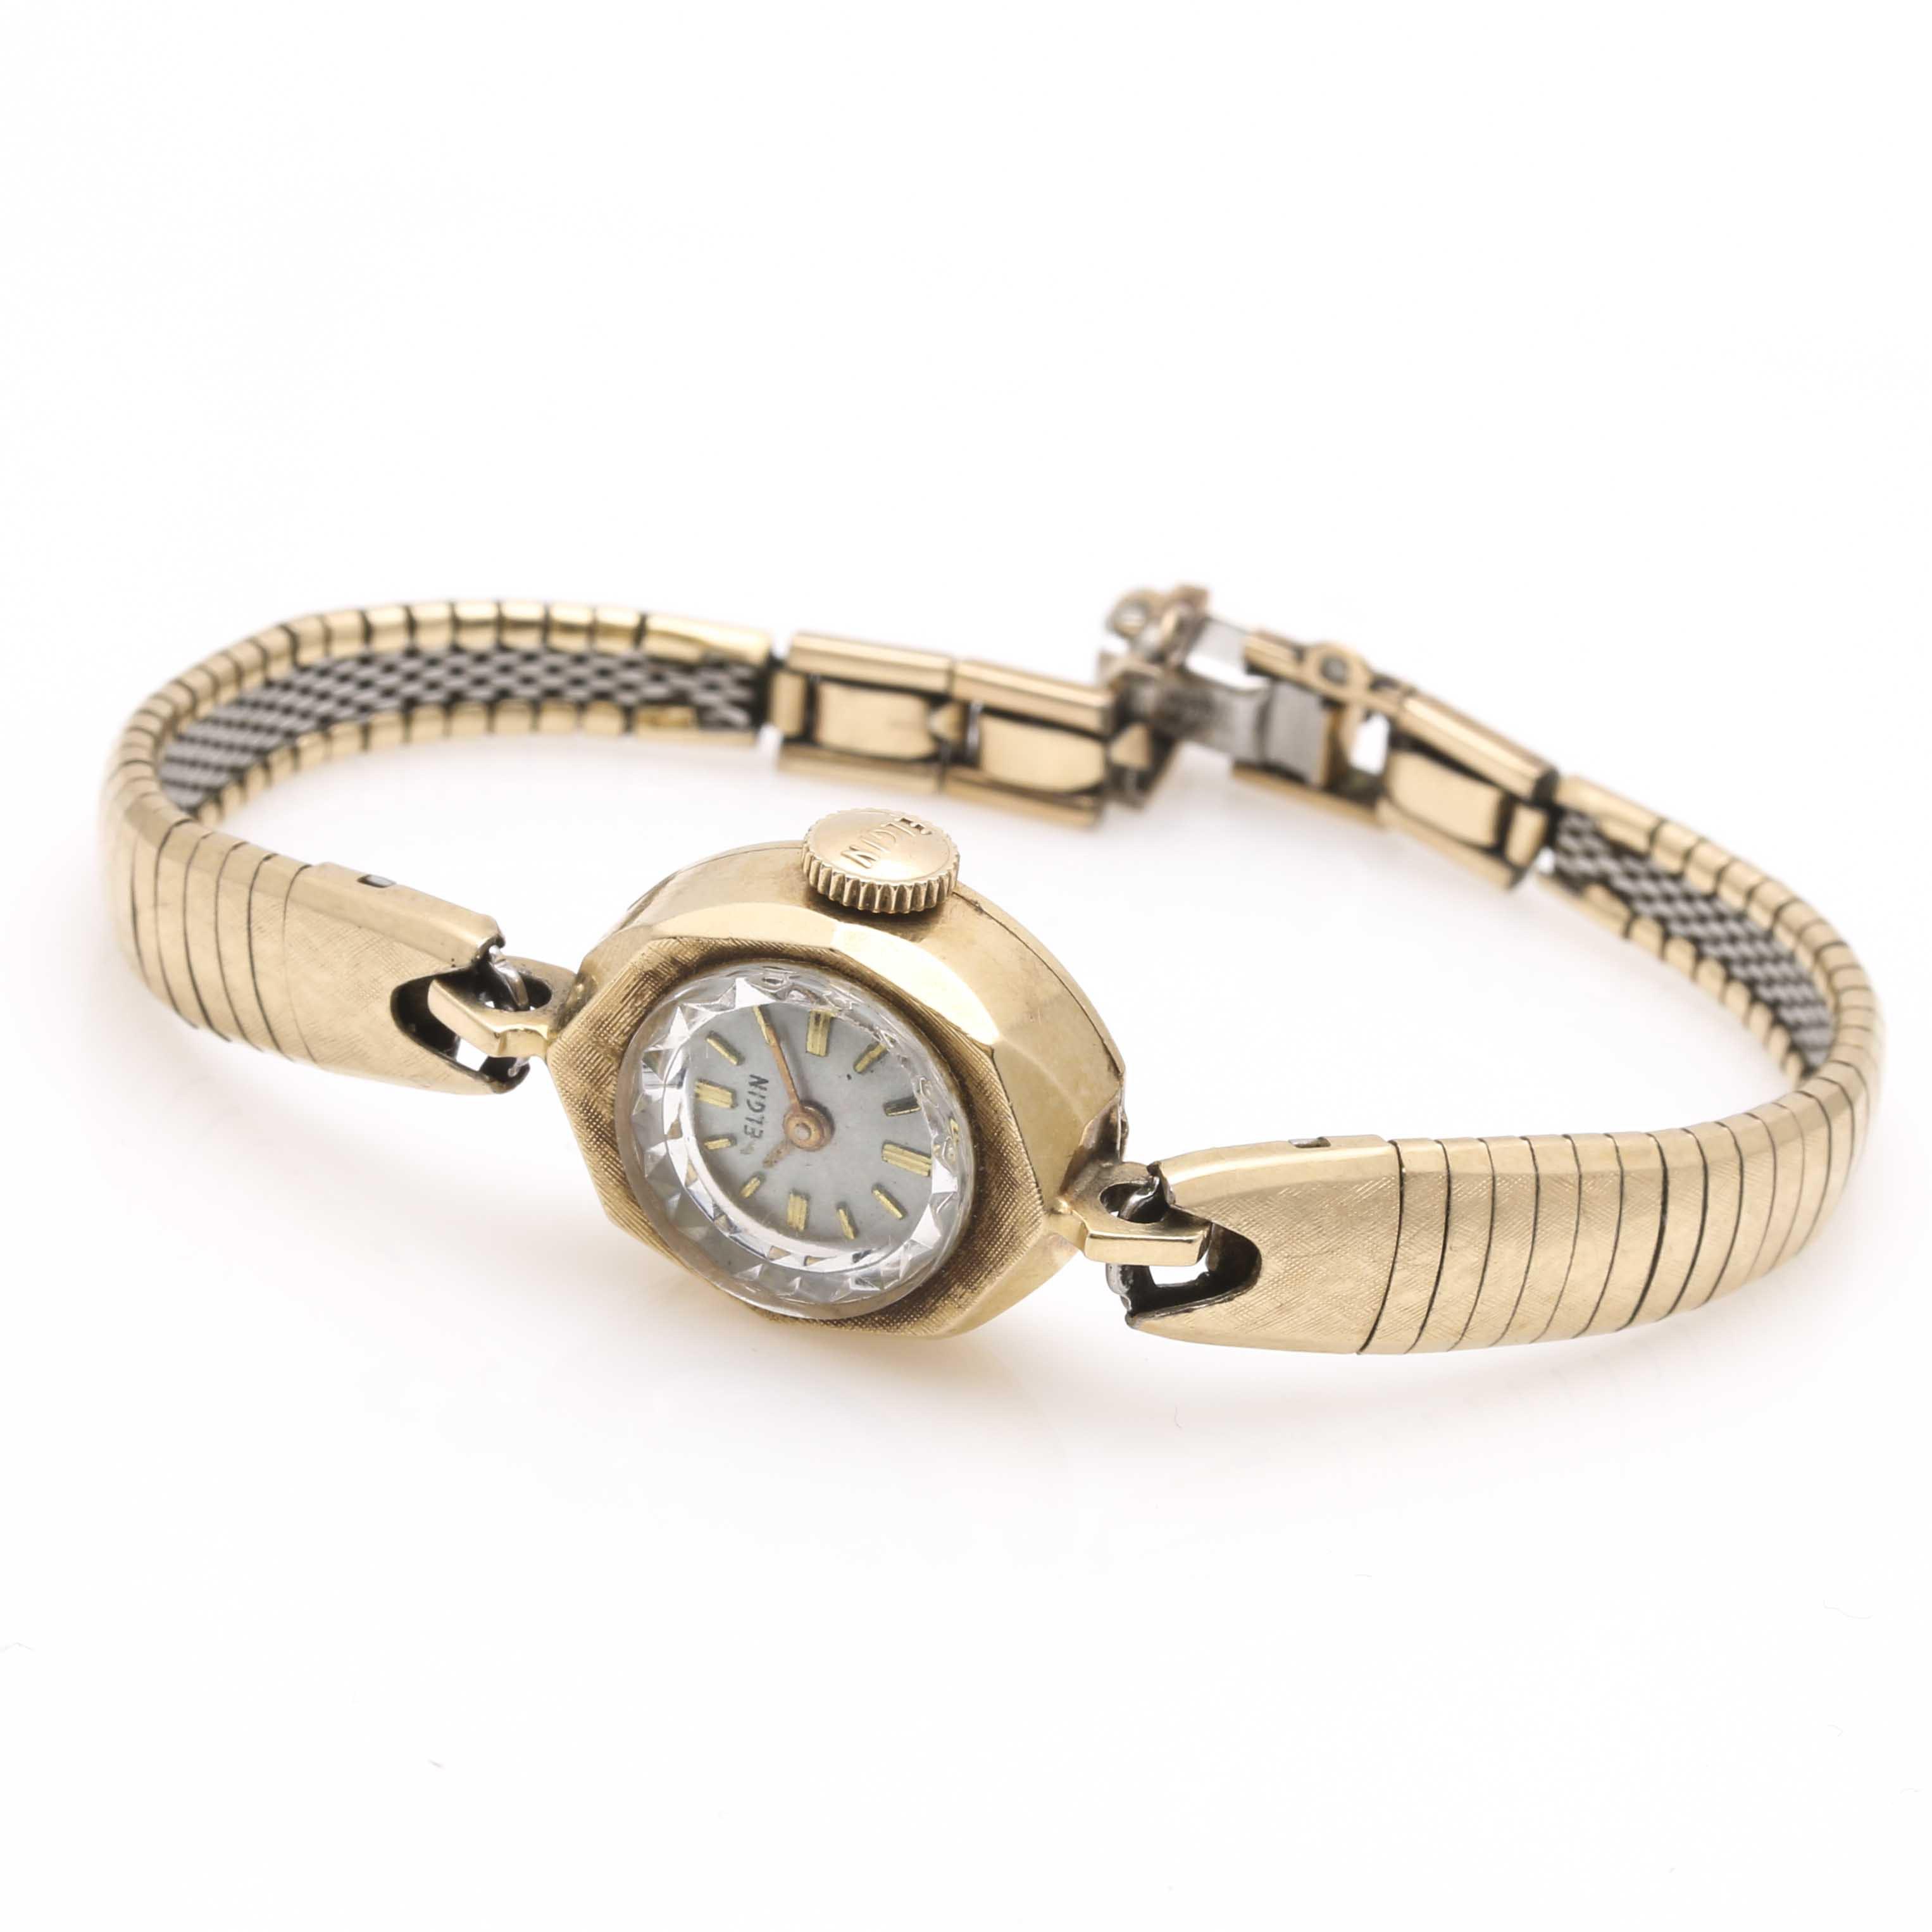 Elgin 14K Yellow Gold Wristwatch